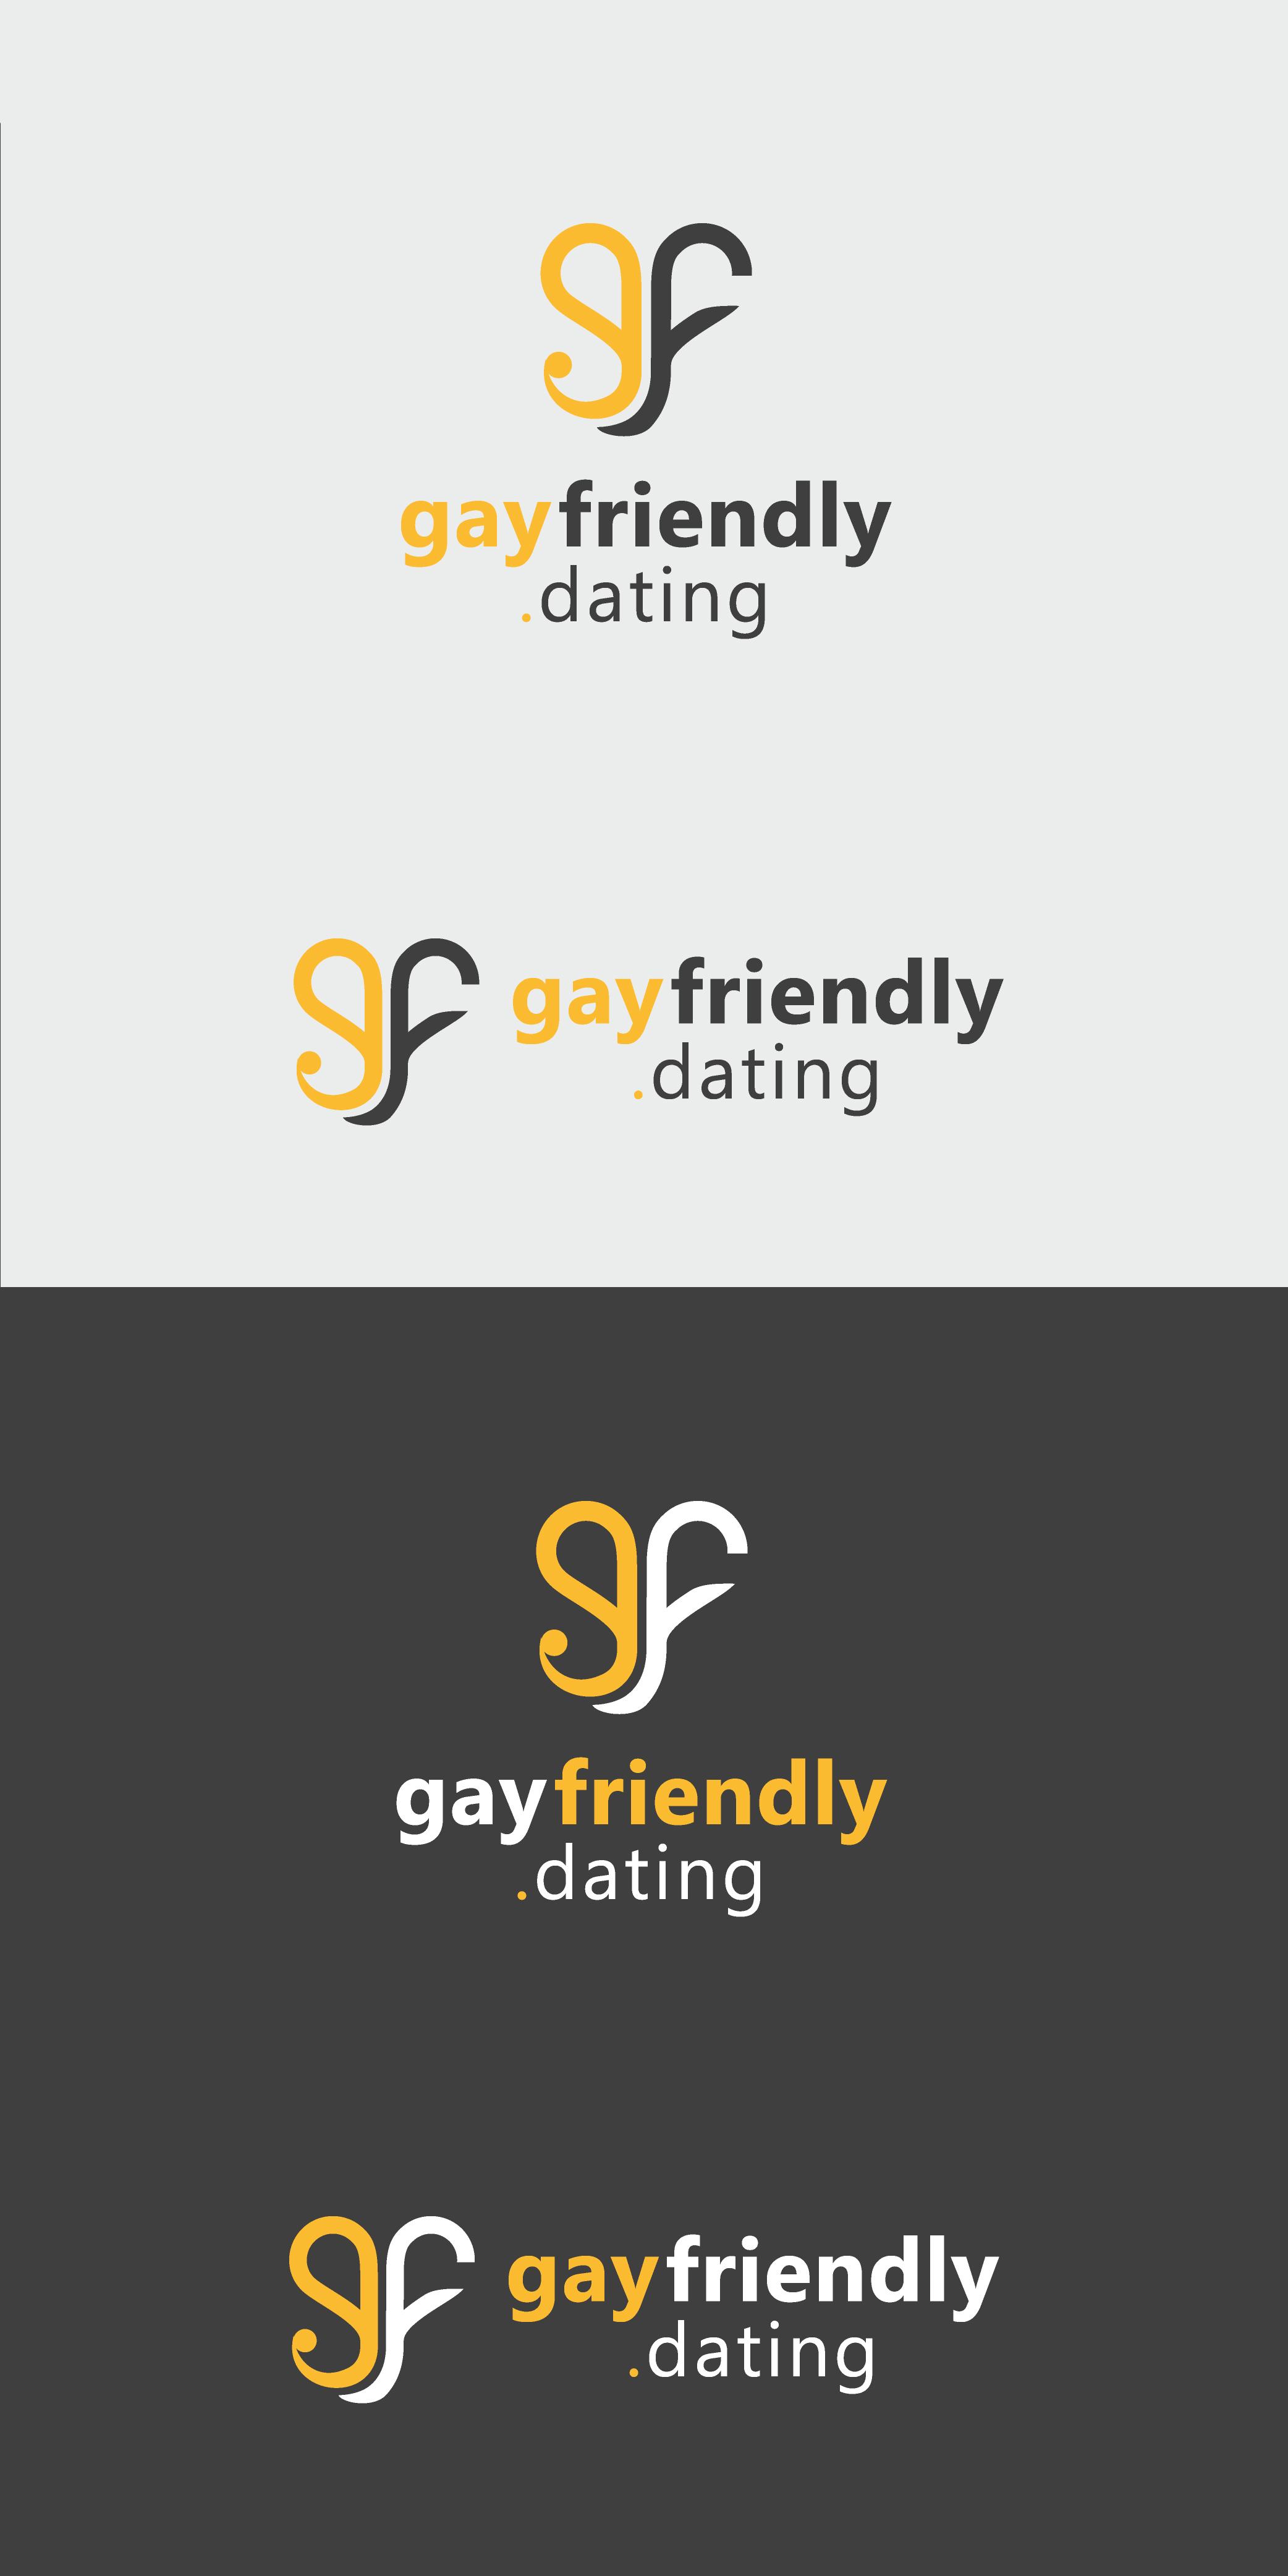 Разработать логотип для англоязычн. сайта знакомств для геев фото f_1275b4475d9841db.jpg